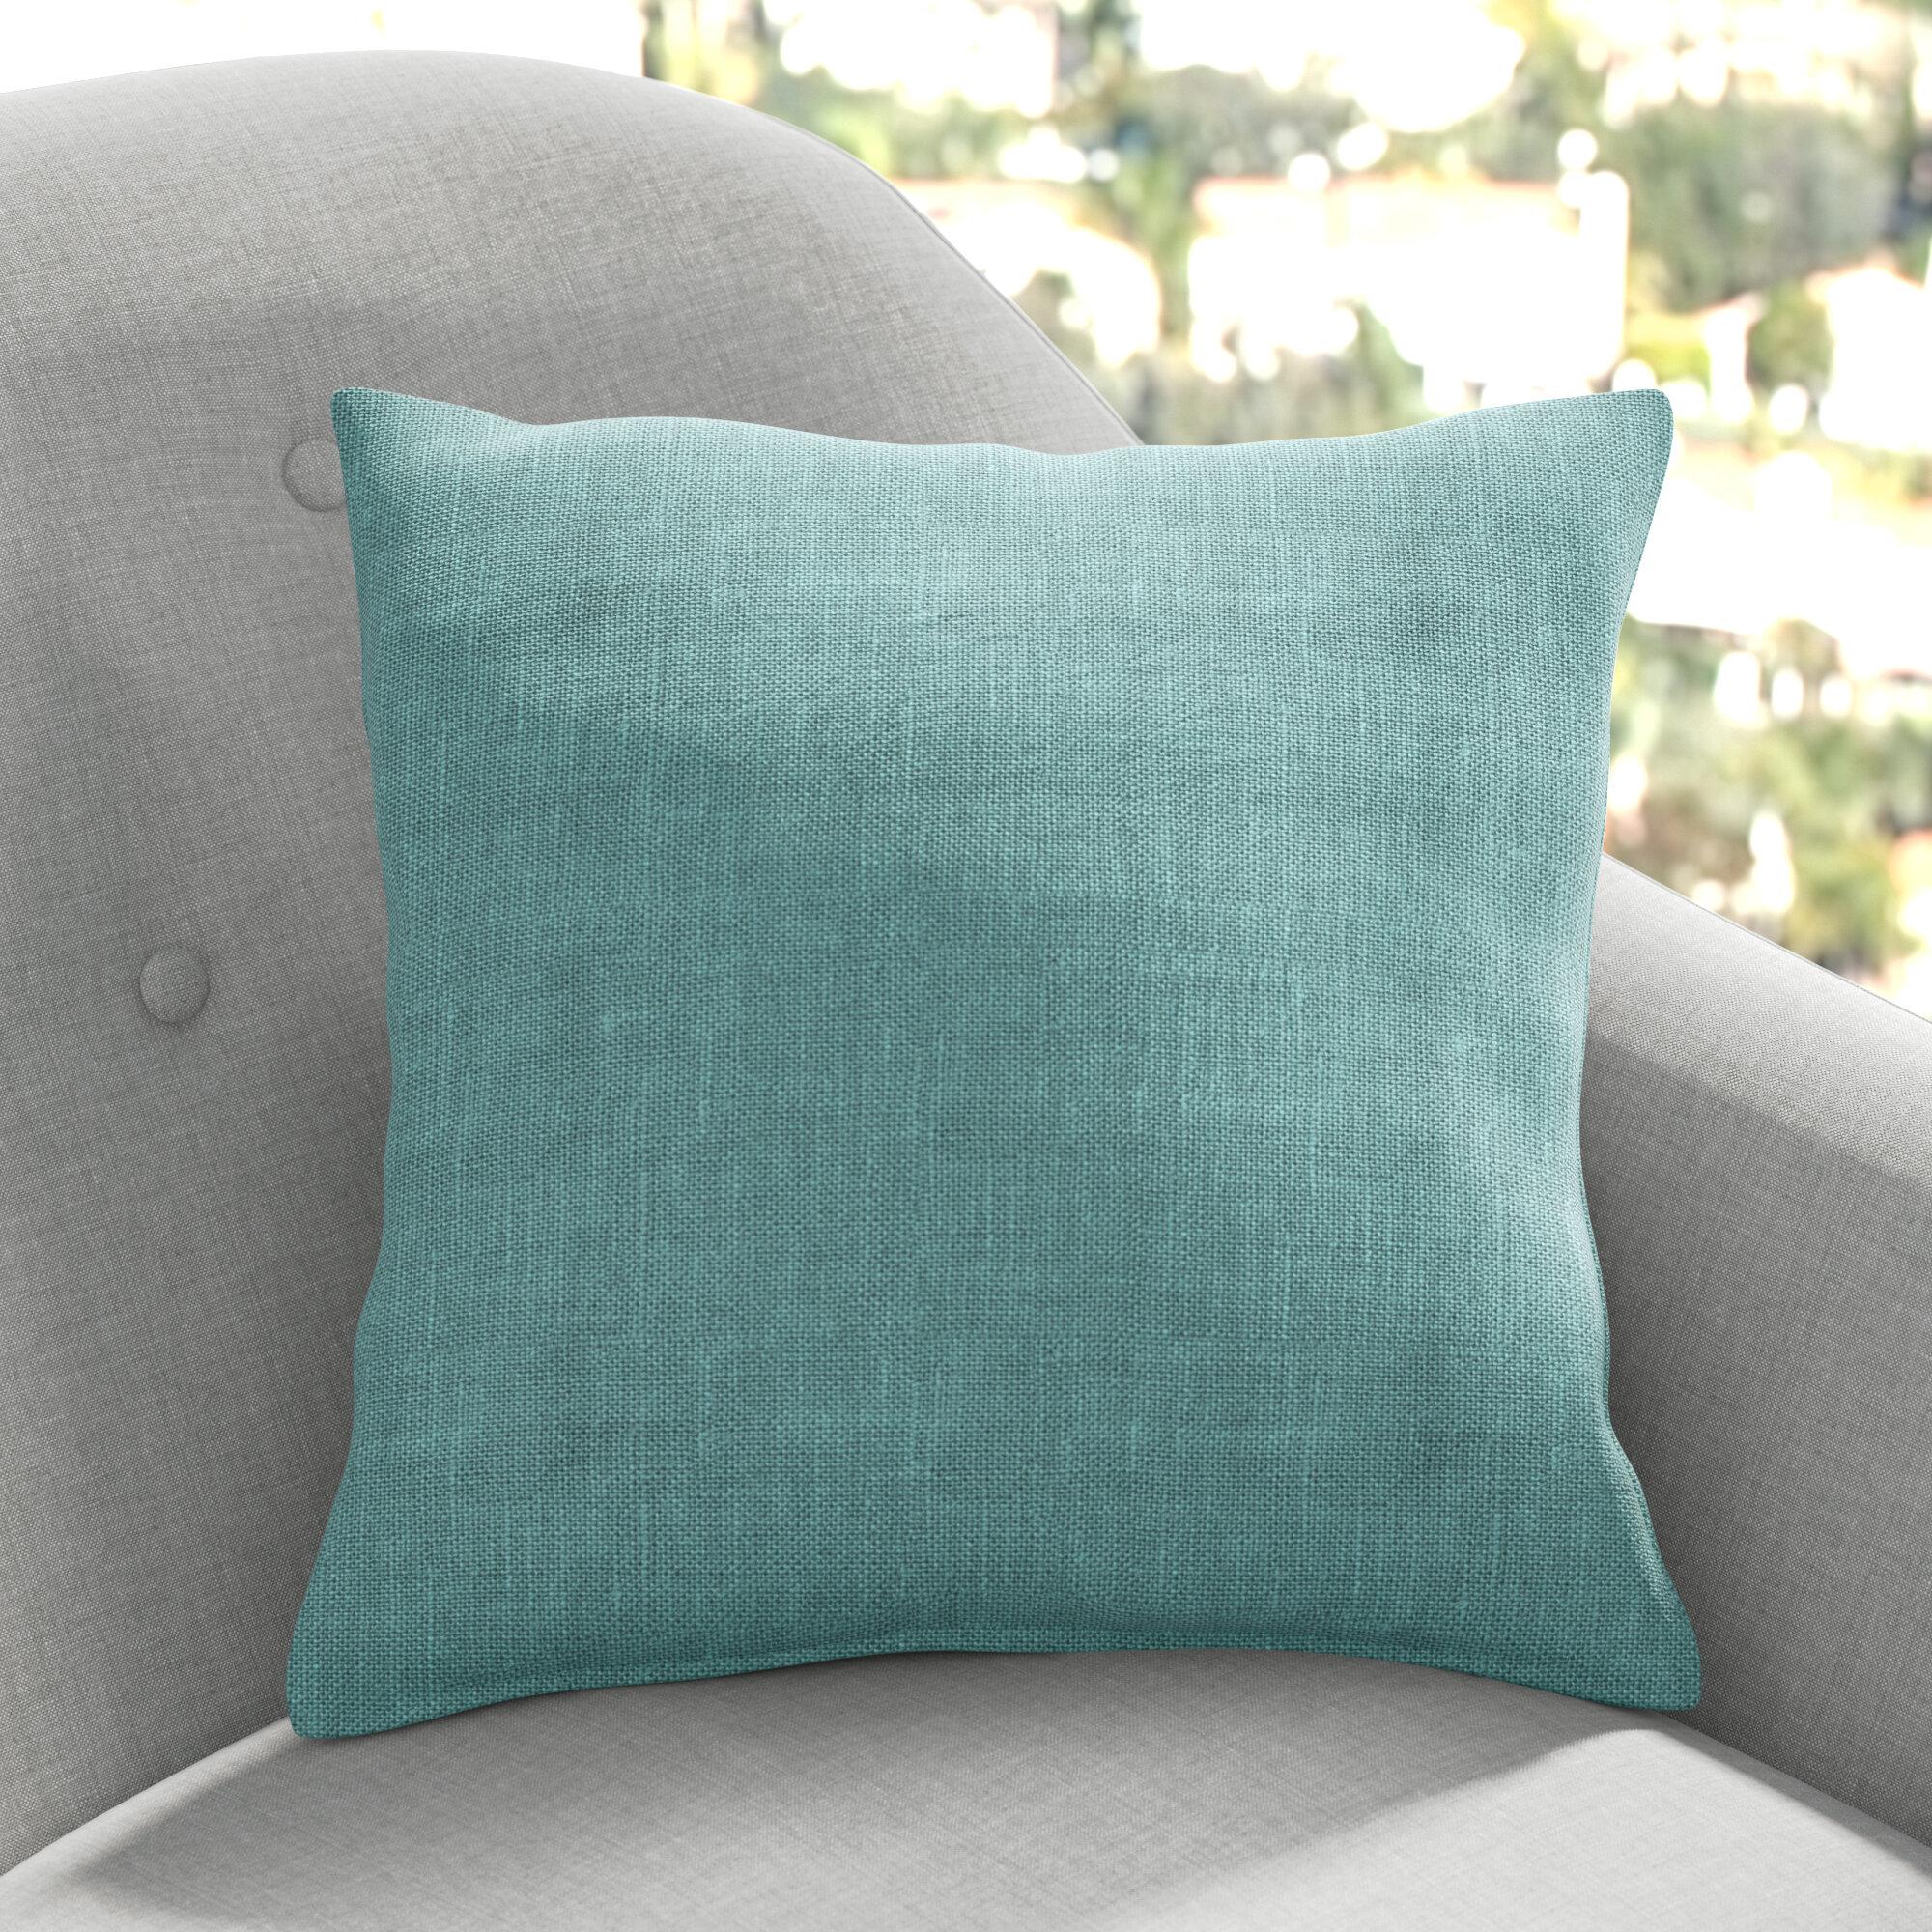 mercury row borrego throw pillow & reviews   wayfair What Is a Throw Pillow